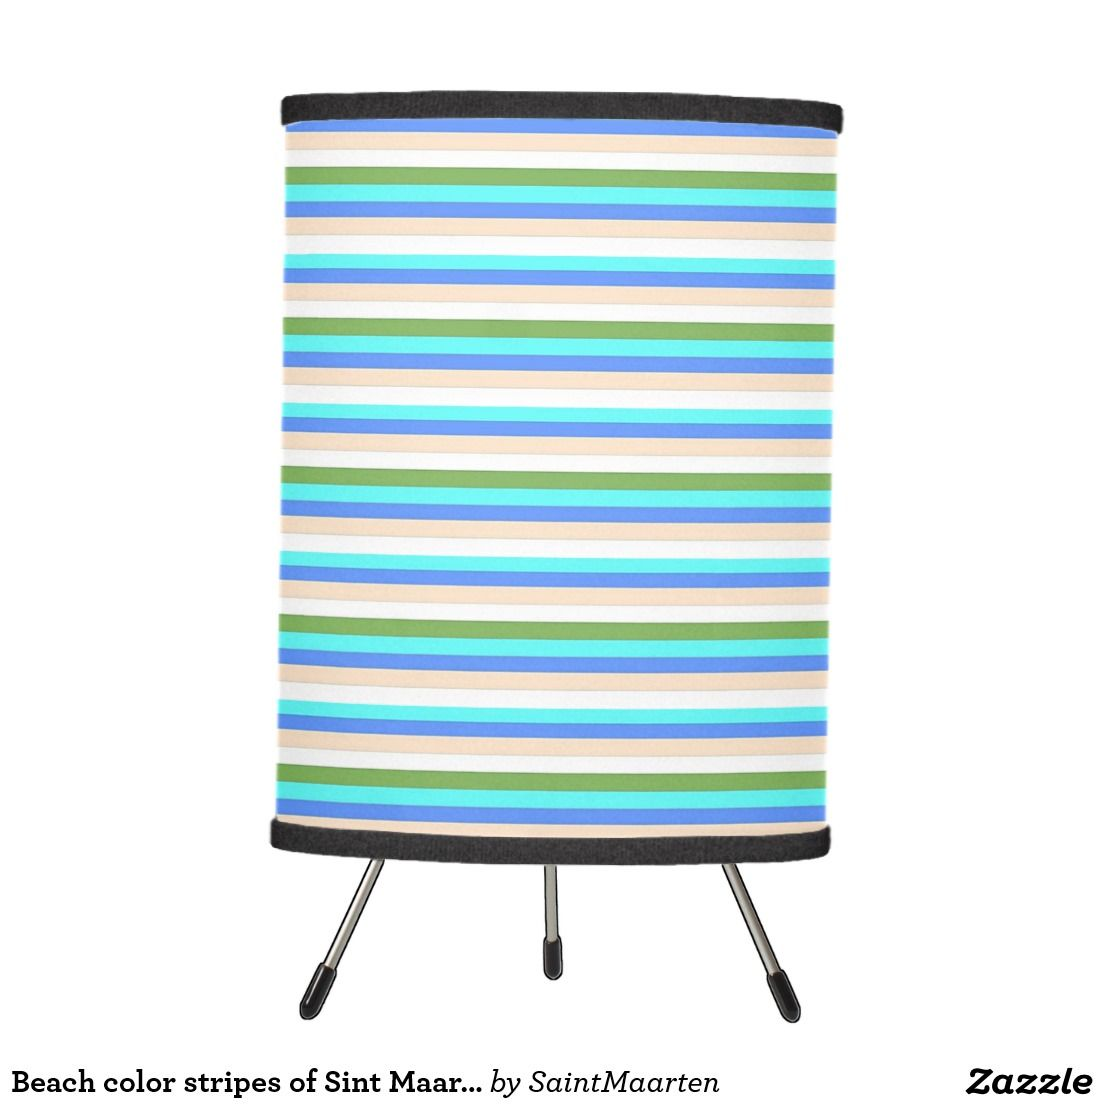 Beach color stripes of Sint Maarten lamp